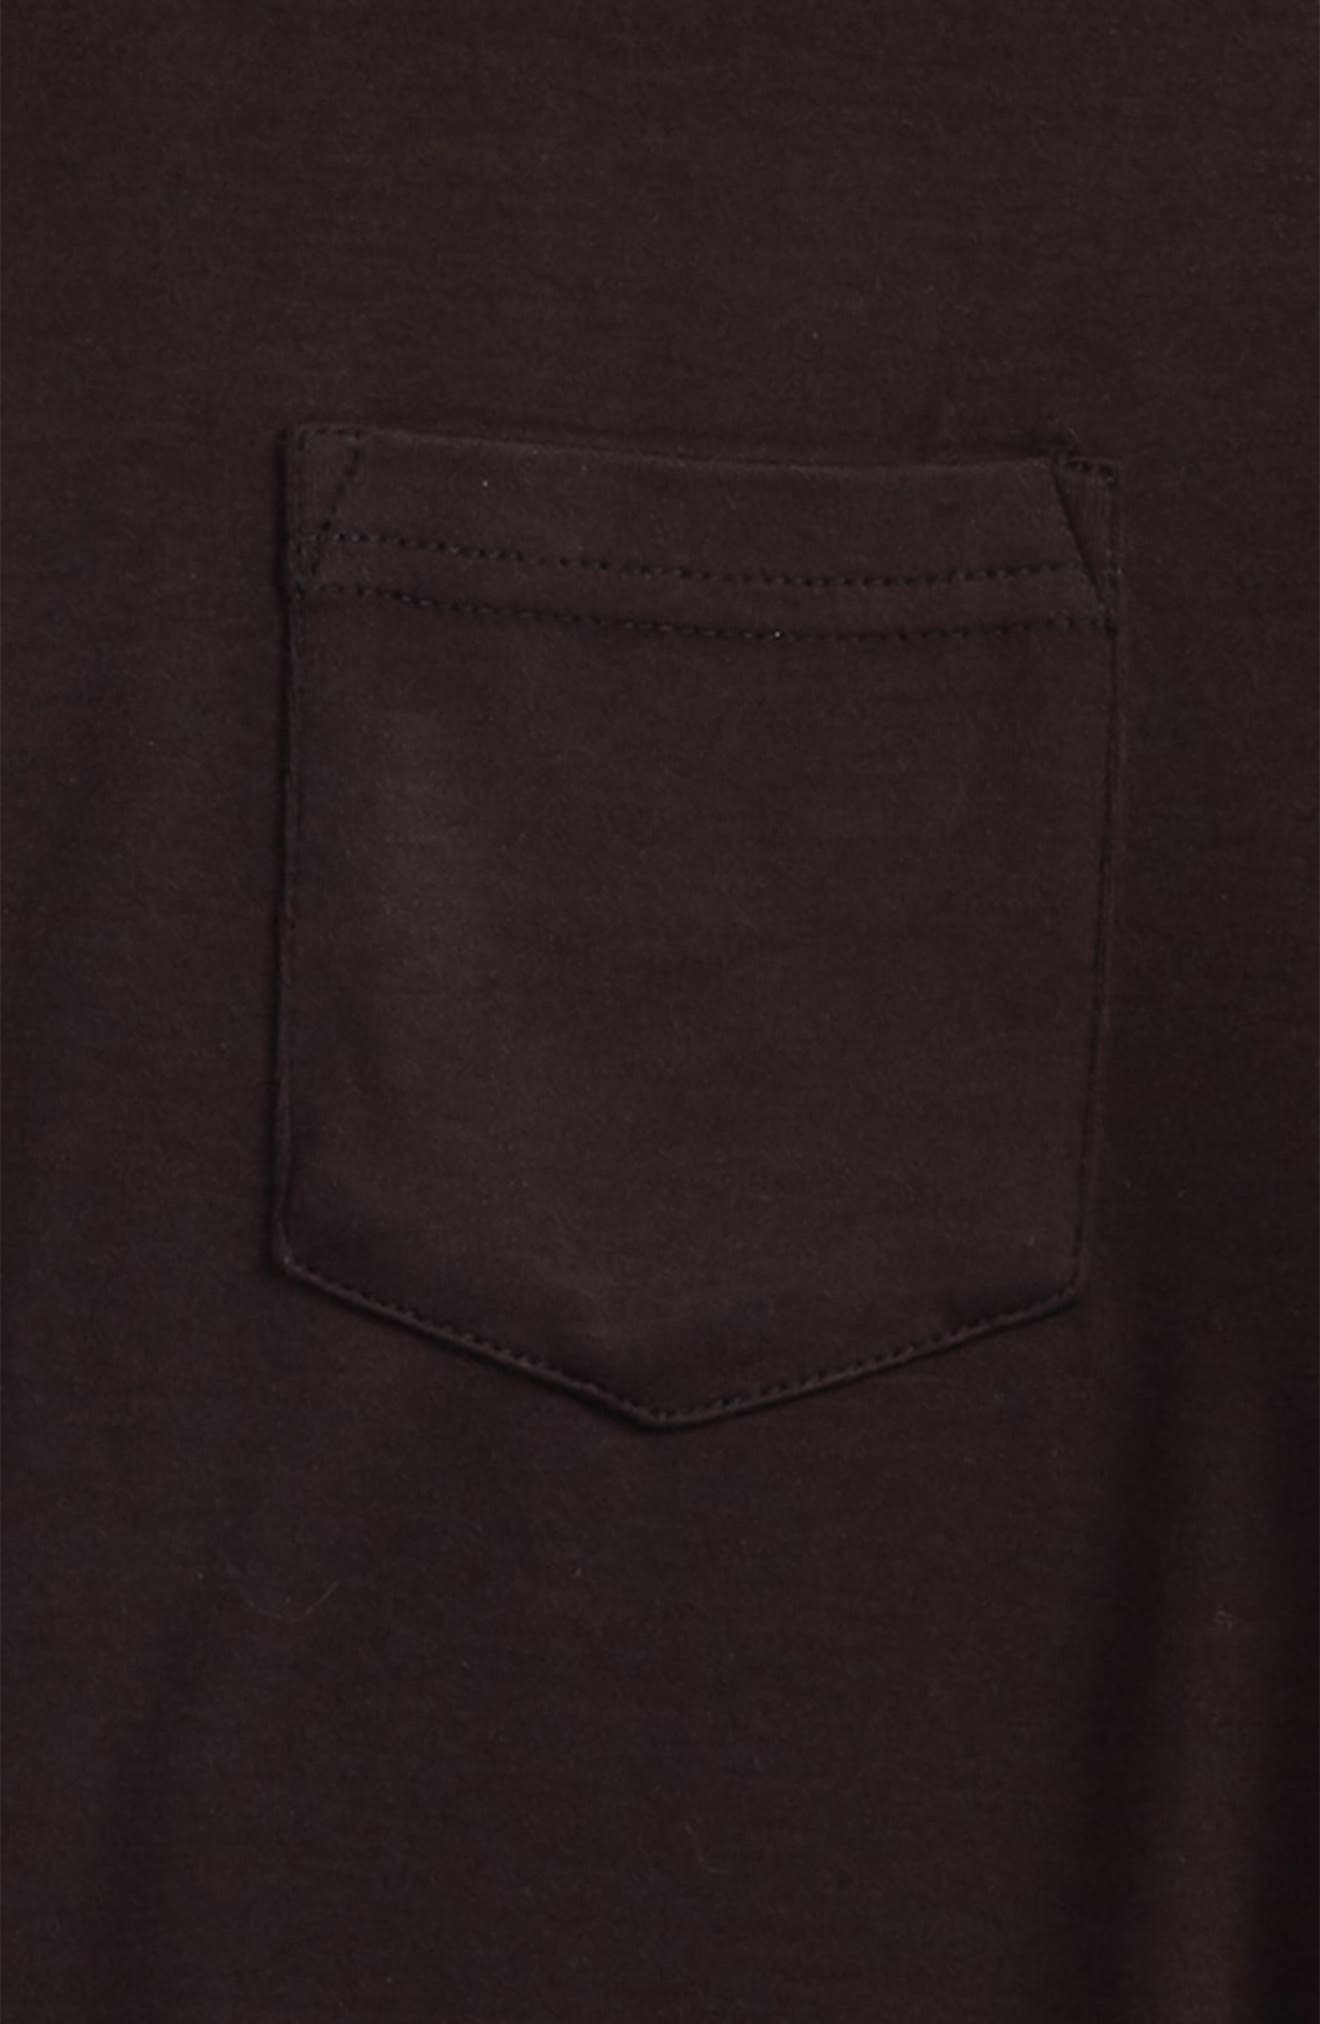 Brycen T-Shirt,                             Alternate thumbnail 2, color,                             001